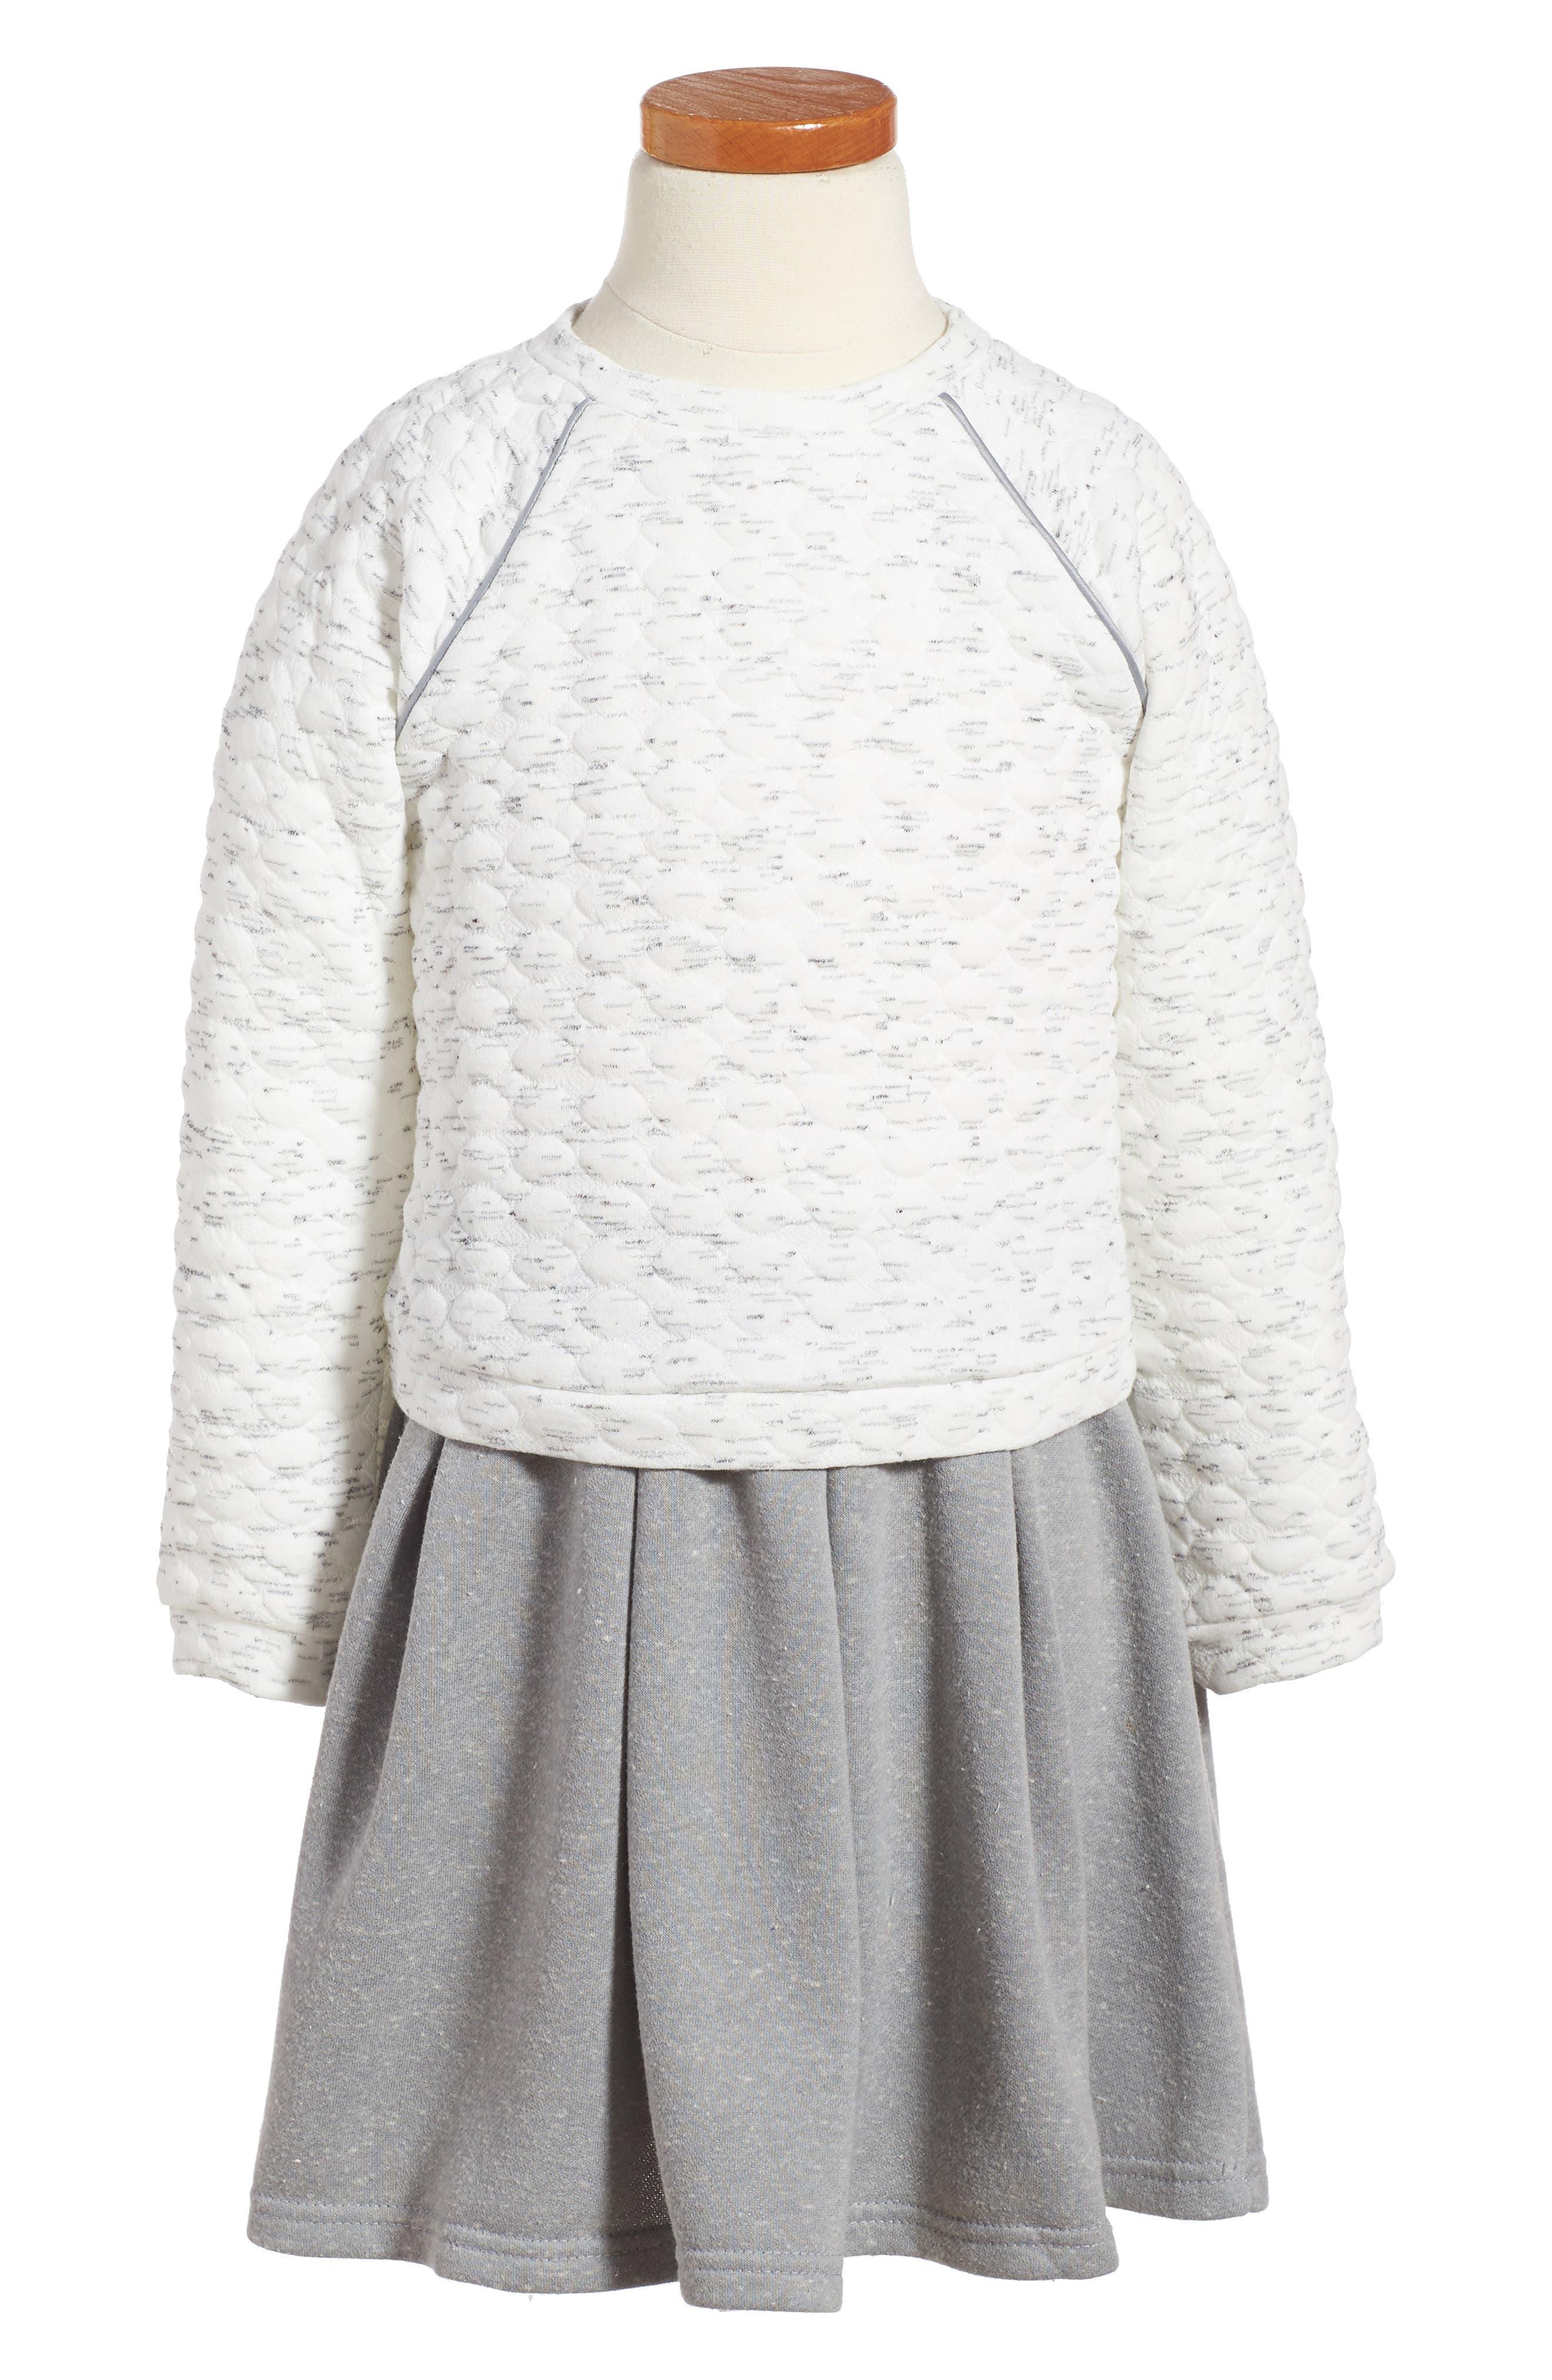 PIPPA & JULIE Sleeveless Dress & Sweatshirt Set